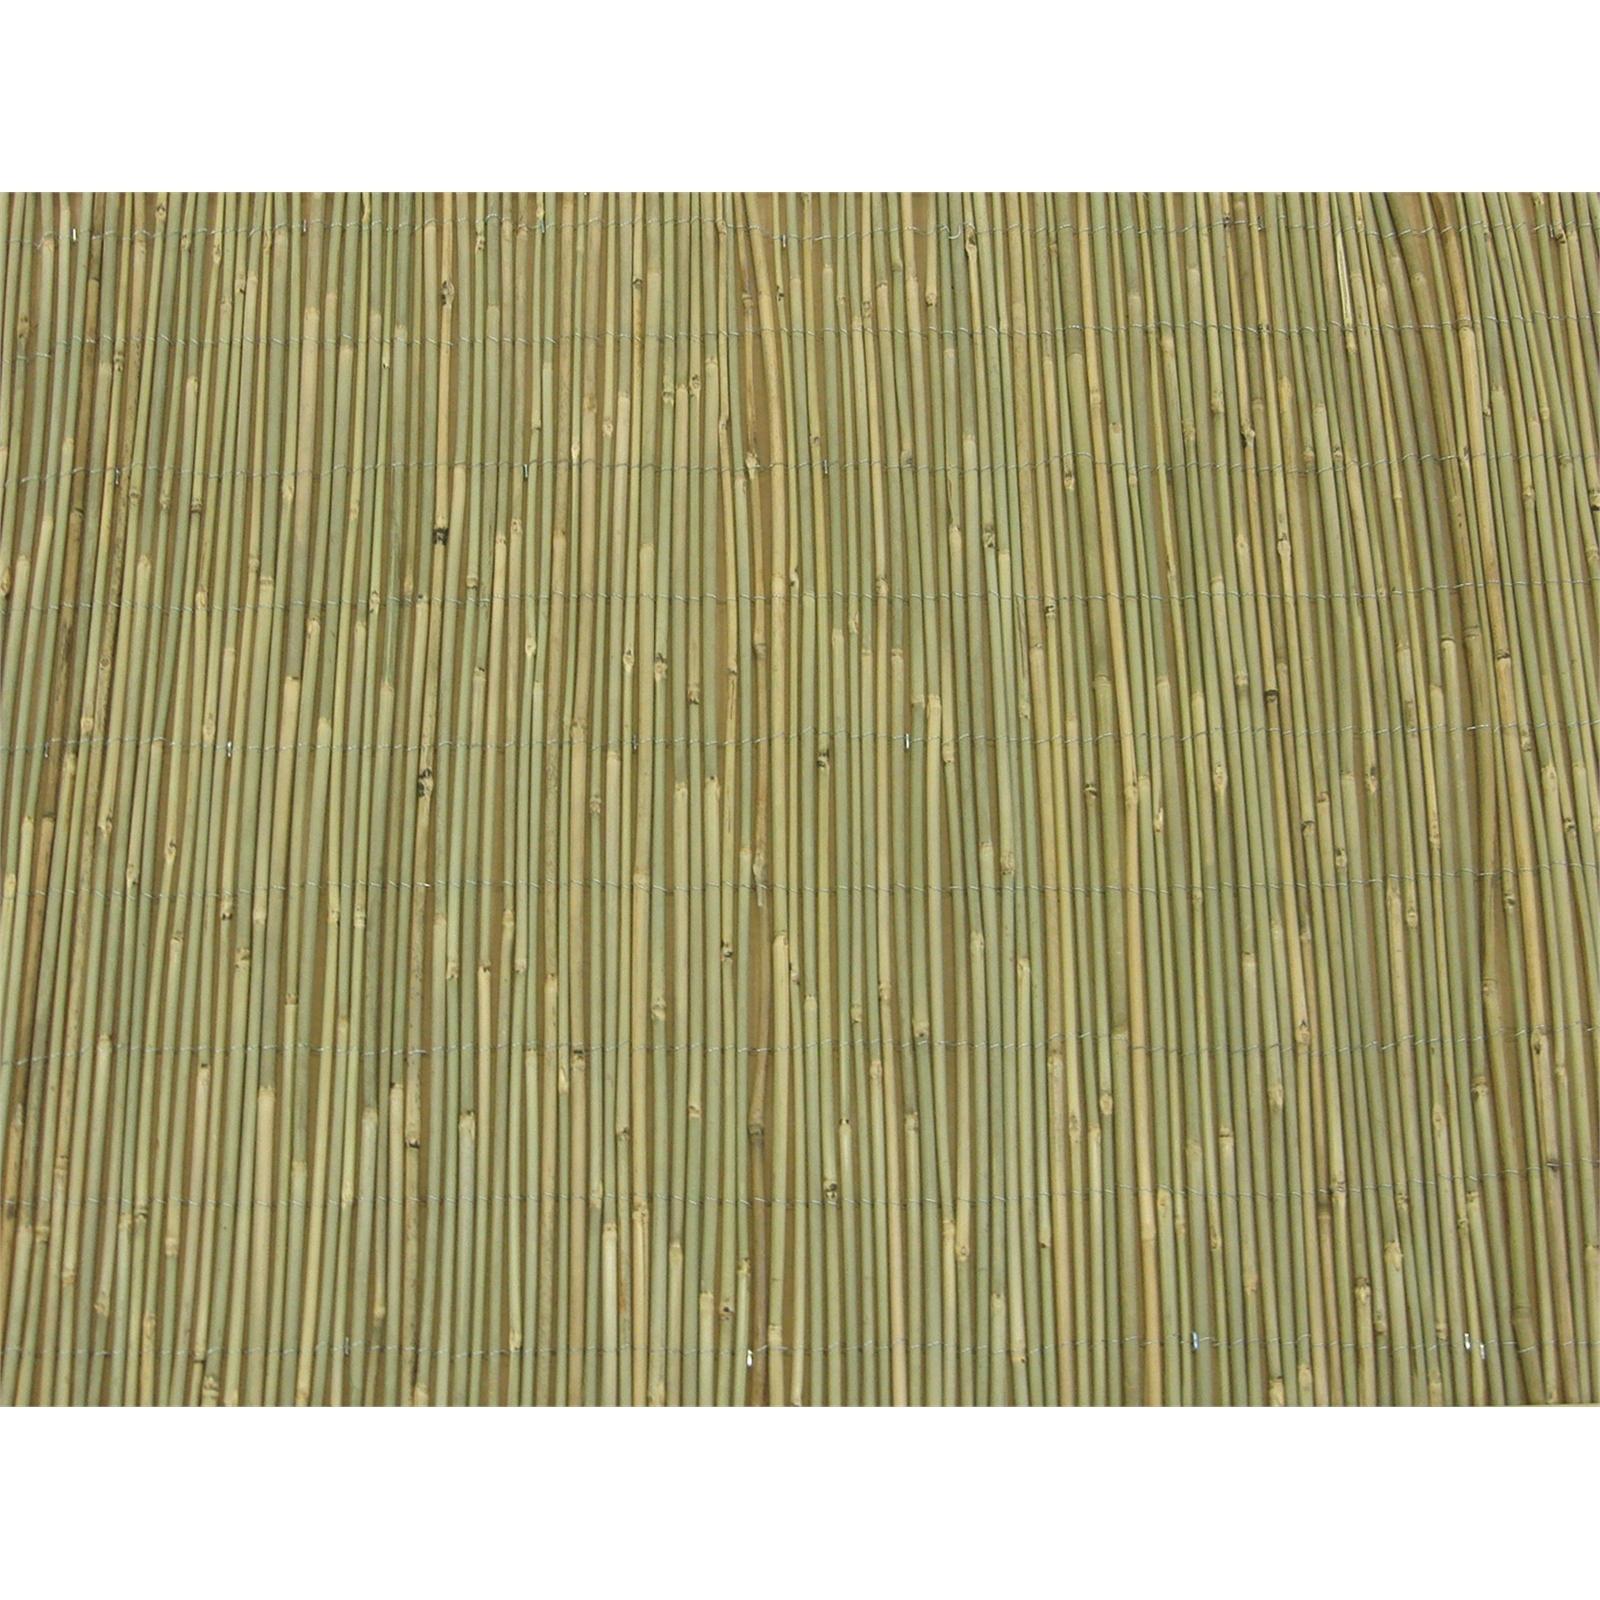 EDEN 1.8 x 3m Natural Bamboo Screen Fencing